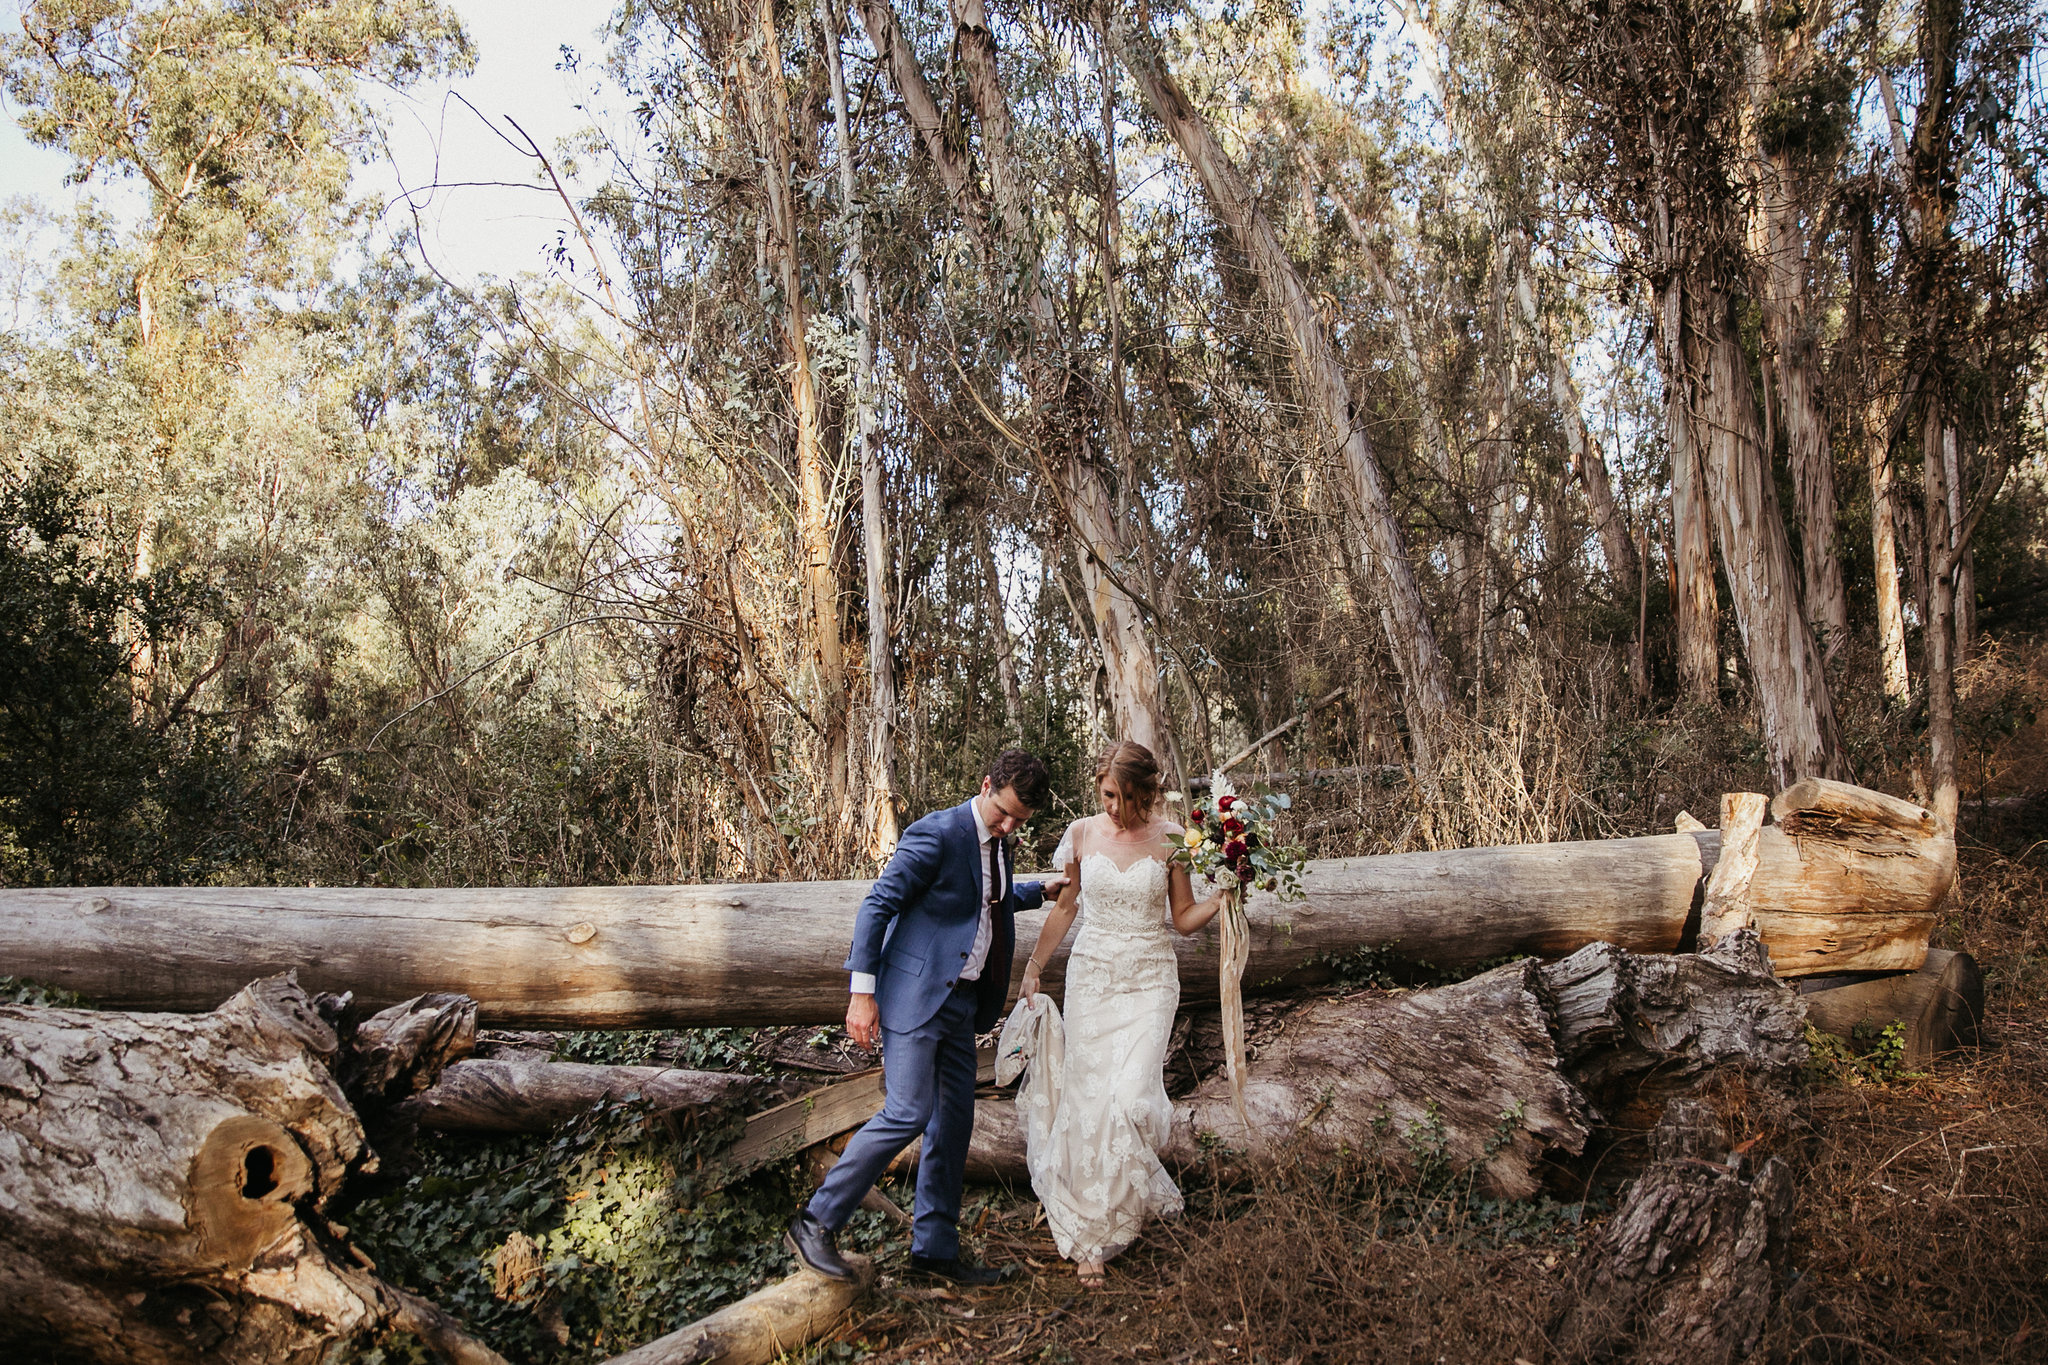 santa-barbara-elopement-wedding-planner-planning-coordinator-day-of-ellwood-bluff-ocean-front-view-bacara-resort-ritz-carlton-porsche-downtown (14).jpg